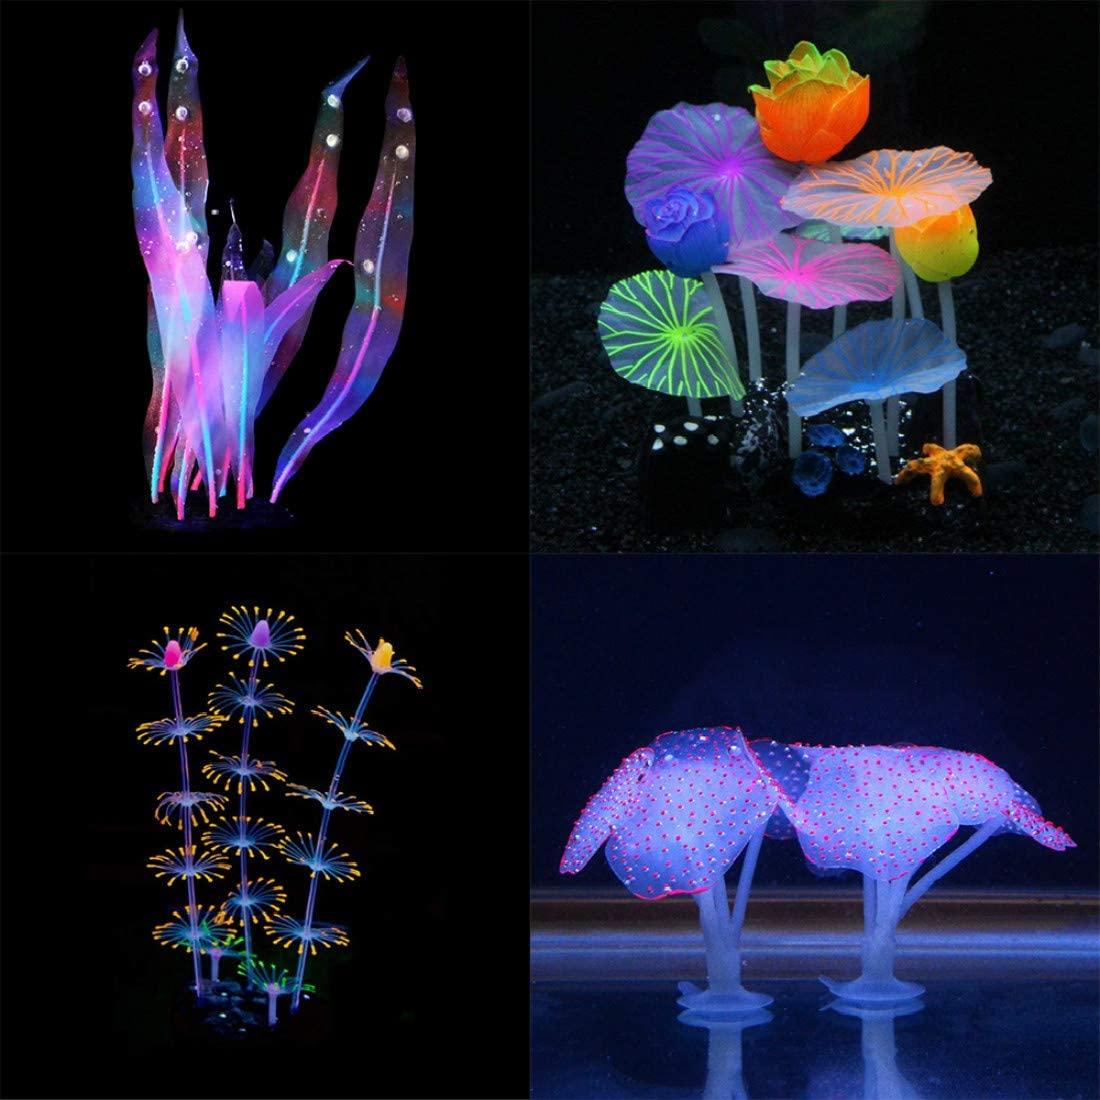 Aquarium Fish Tank Ornament,Simulation Coral Plant Decorations Glowing Silicone Accessories 5Pieces